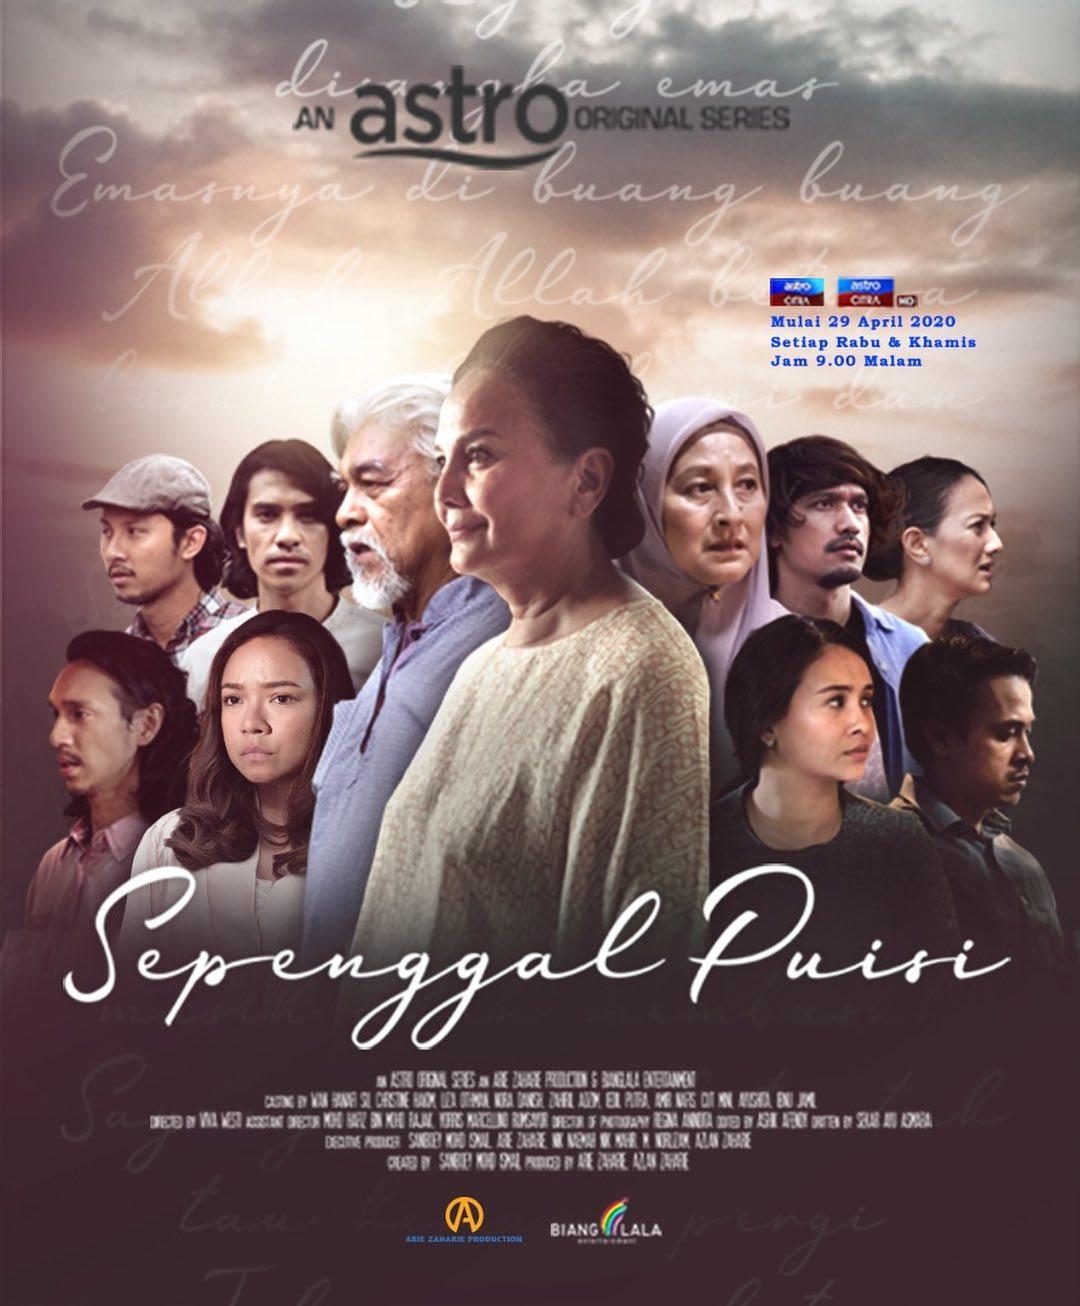 Drama Sepenggal Puisi (2020) Astro Citra